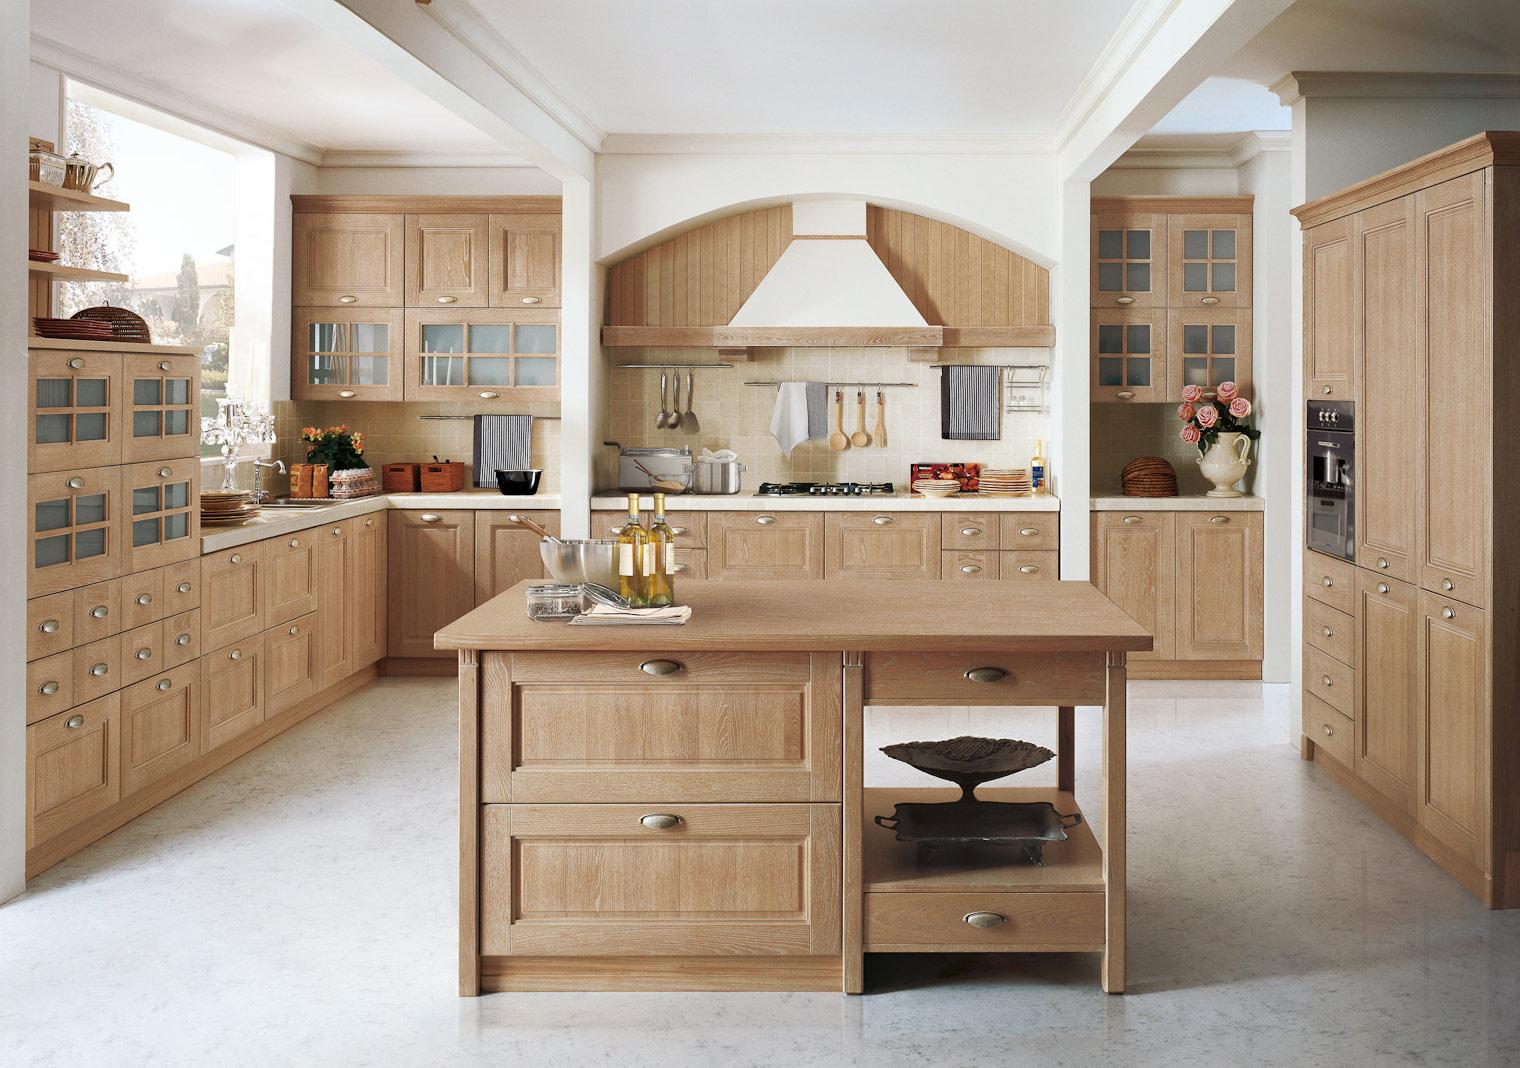 Lovely ... Eurolife Furniture By Ontario Eurolife Kitchens Sydney ...